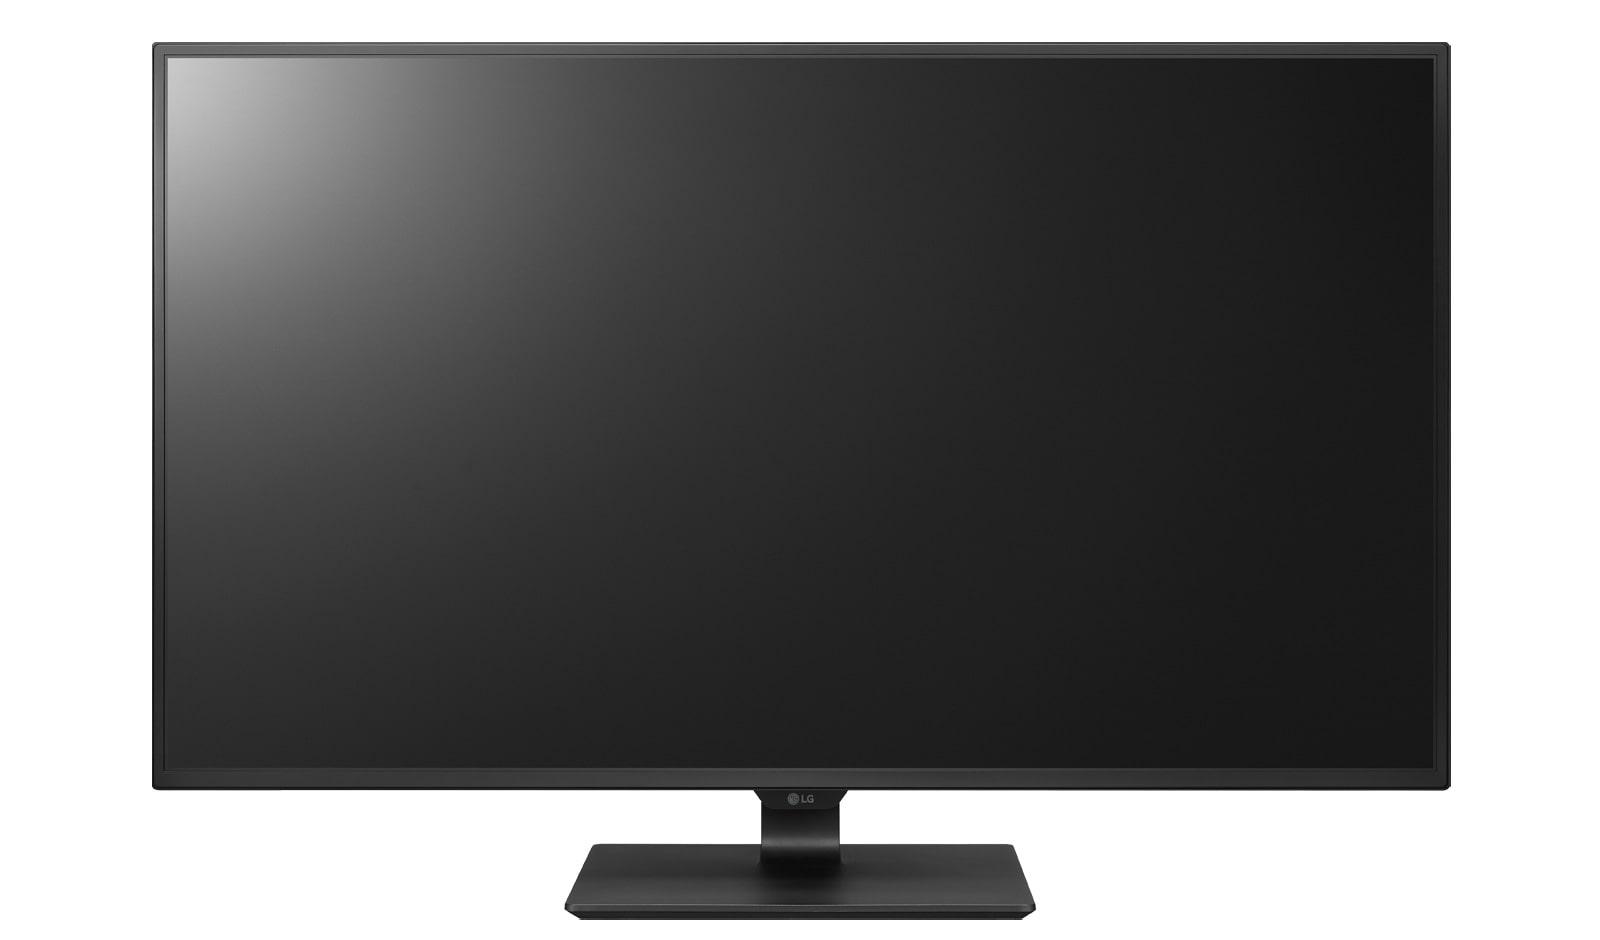 Lg Uhd 4k Ips Monitor 43 Inch Screen 43ud79 B Lg Levant